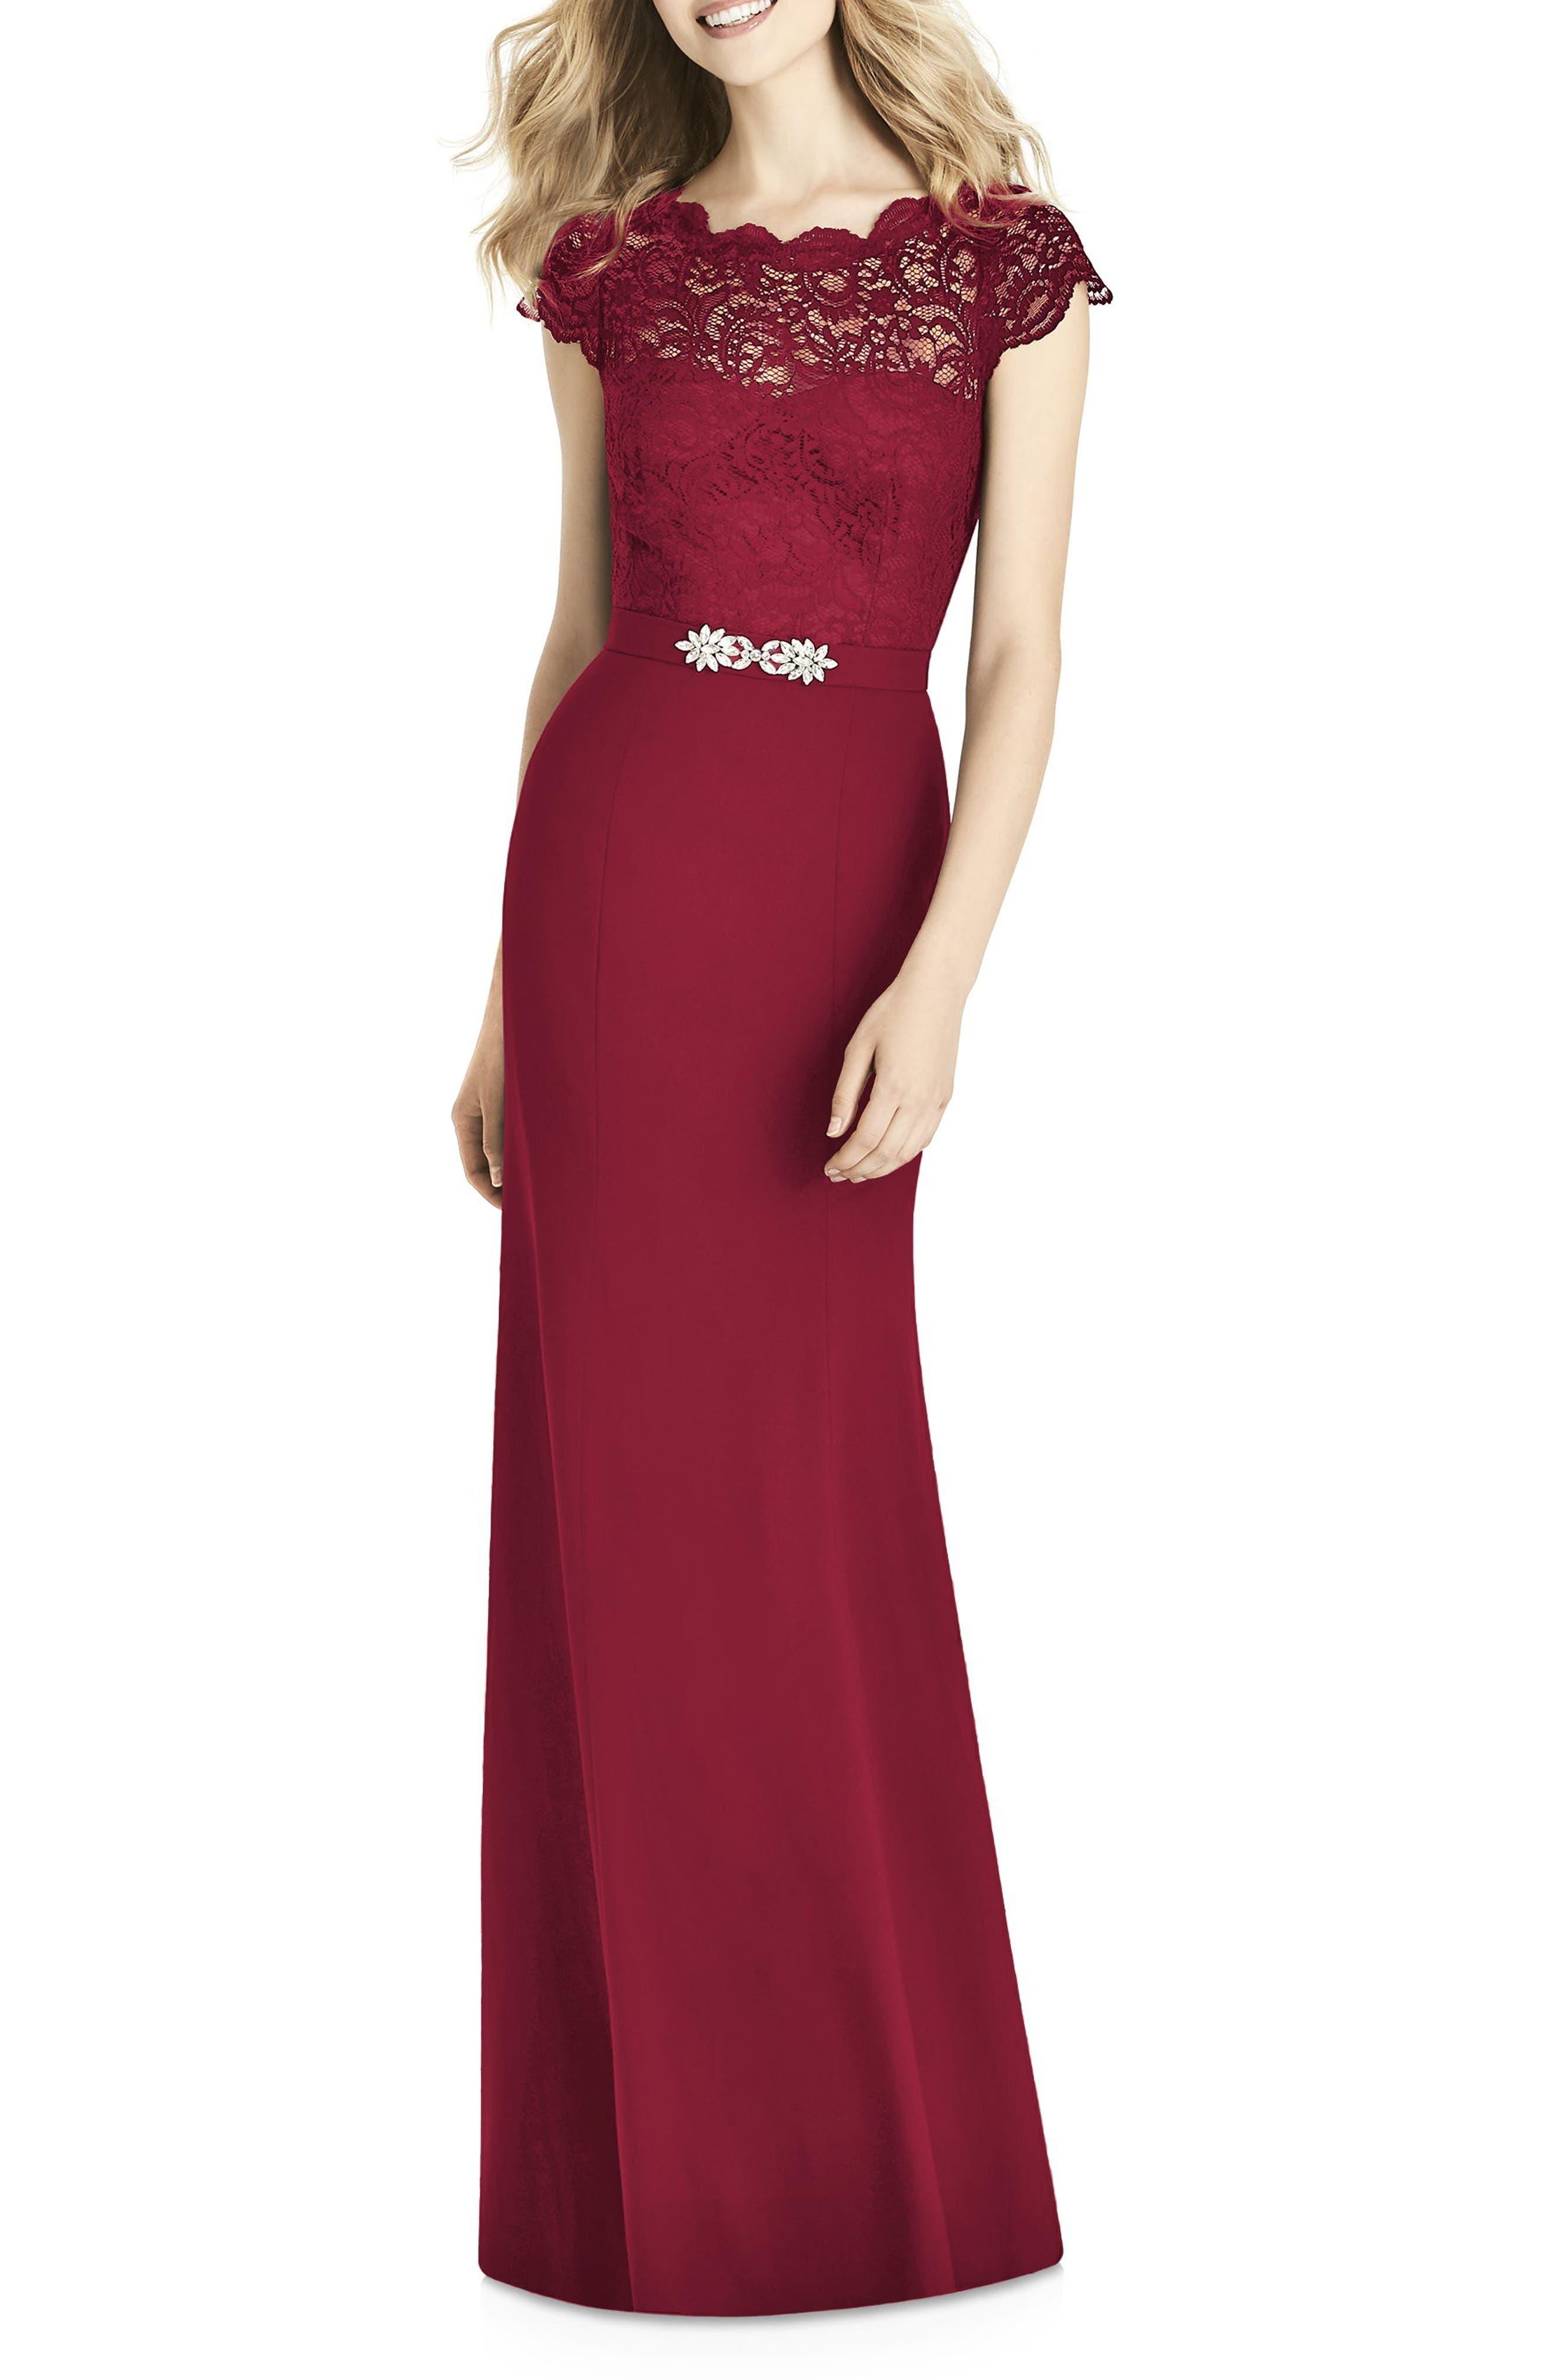 Jenny Packham Lace & Crepe Sheath Gown, Burgundy